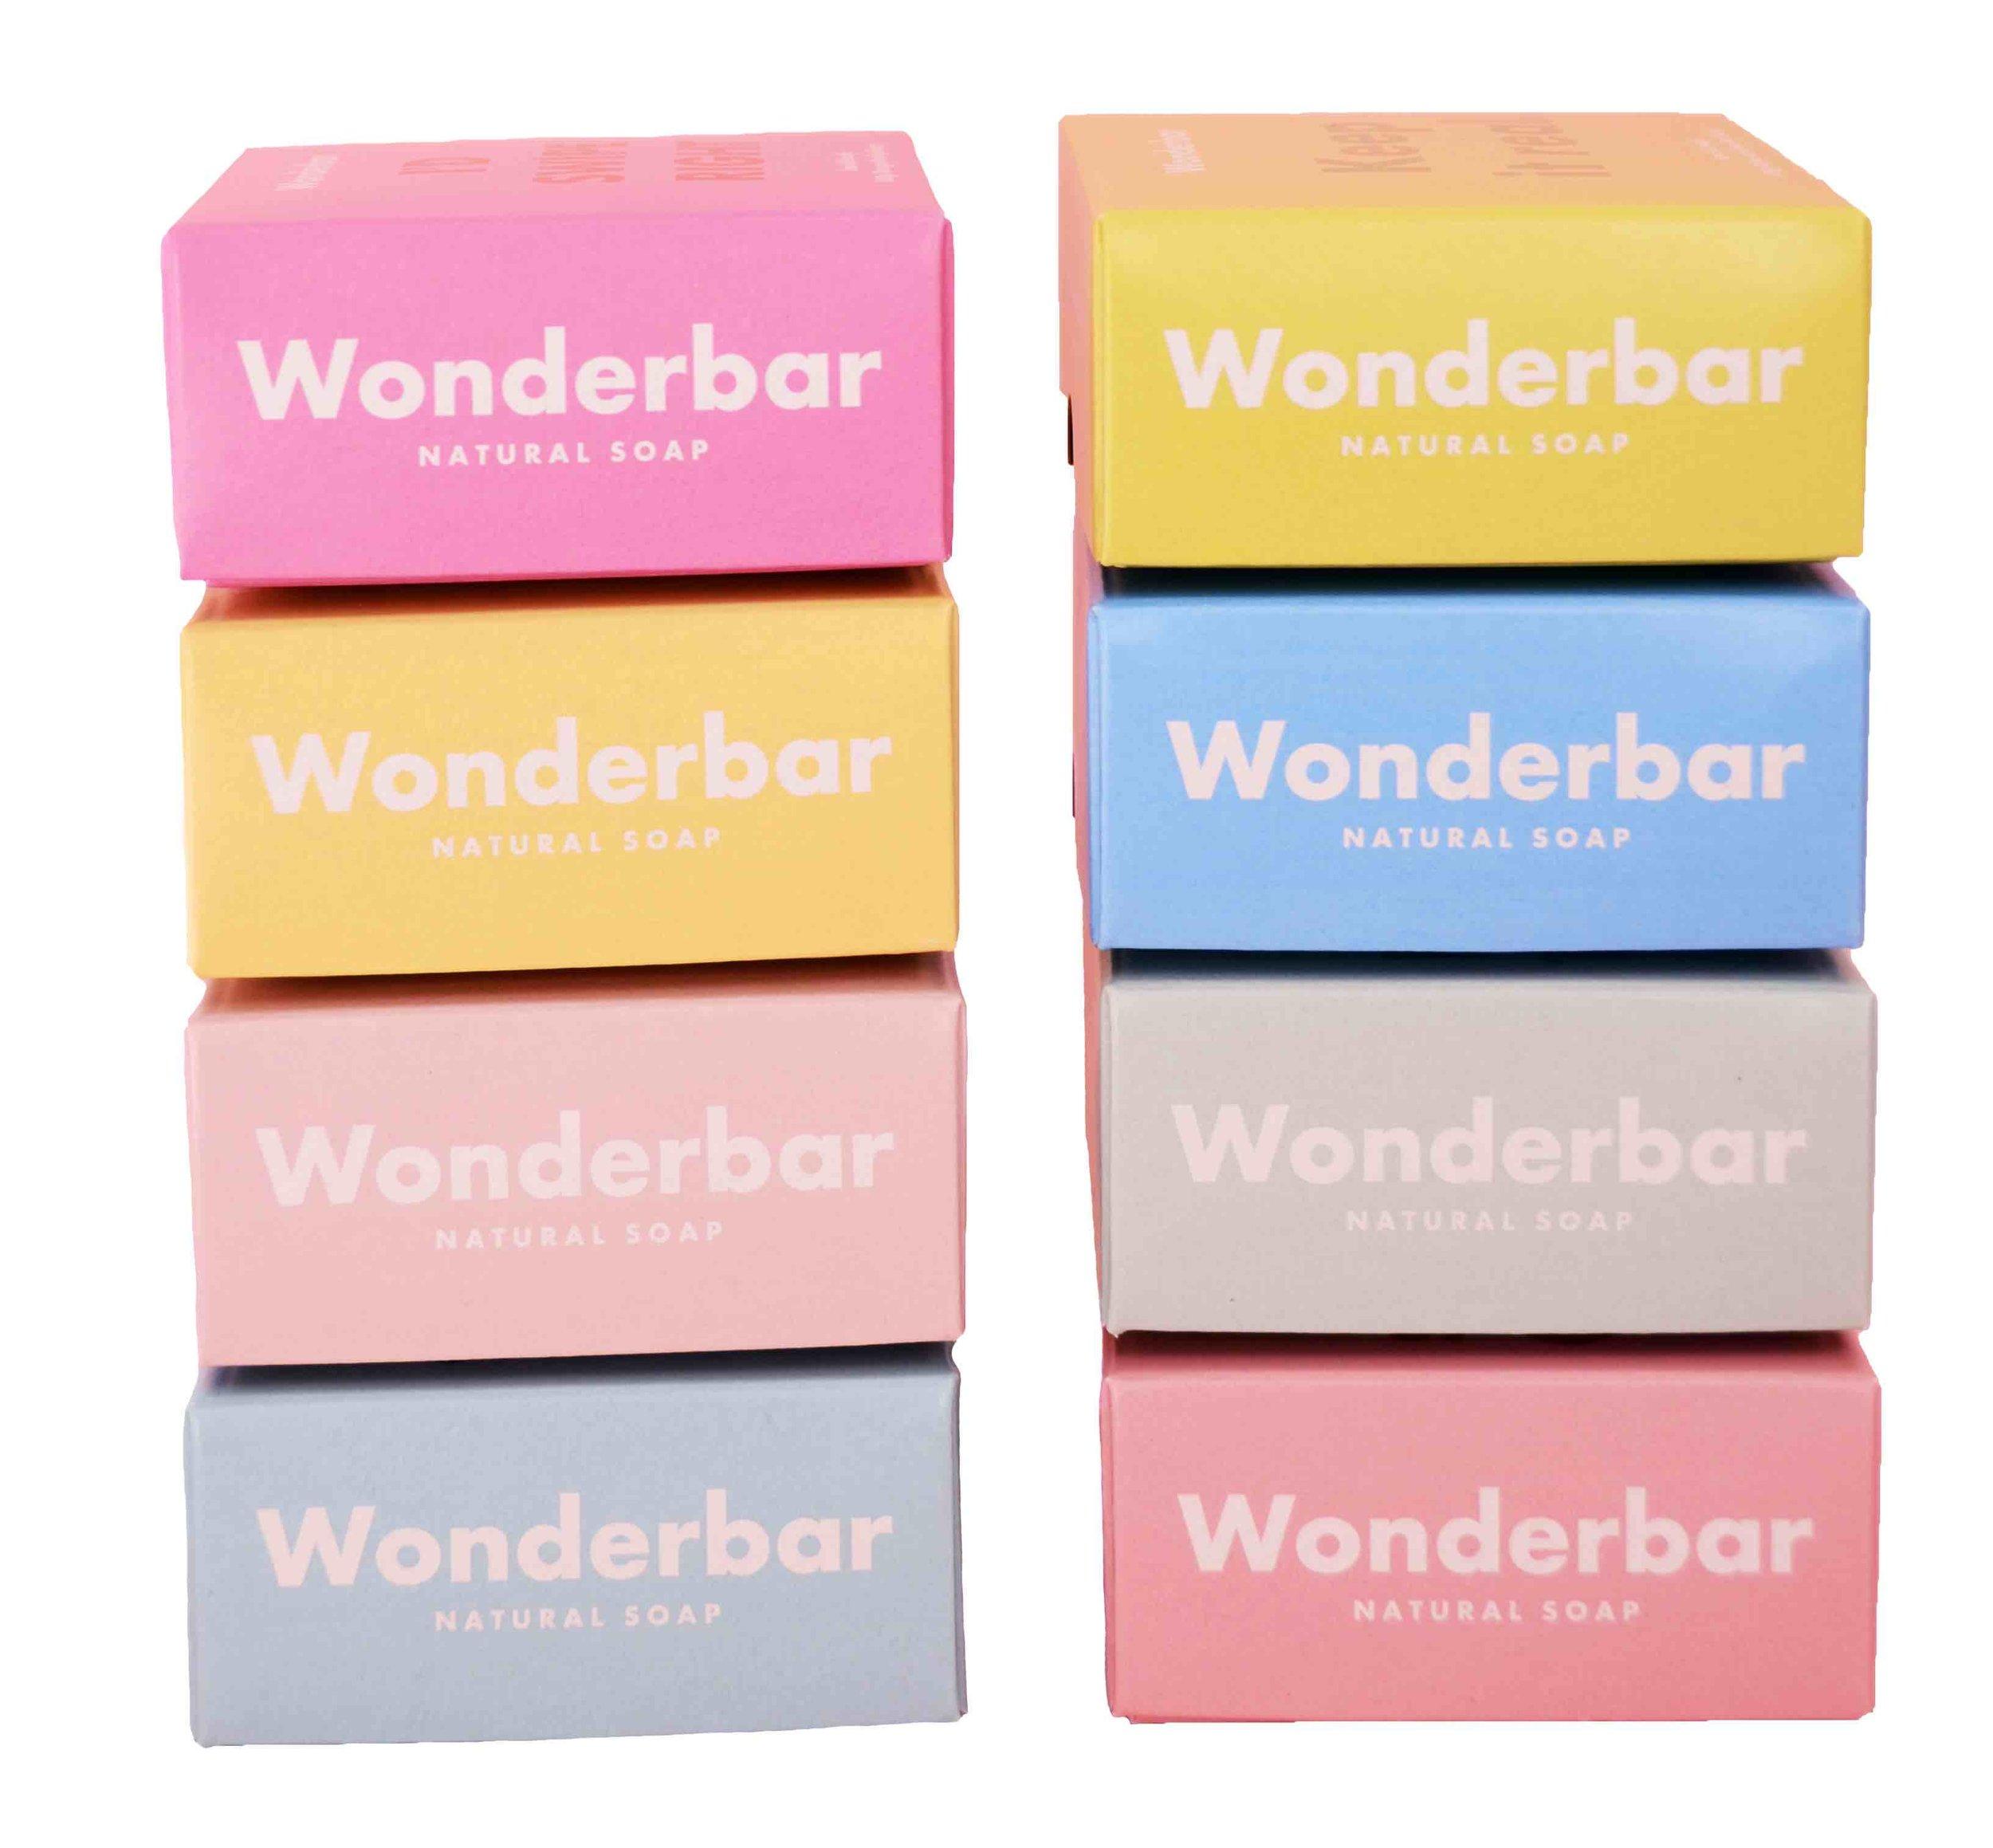 MIX 1.1 wonderbar-soap.com 300.jpg